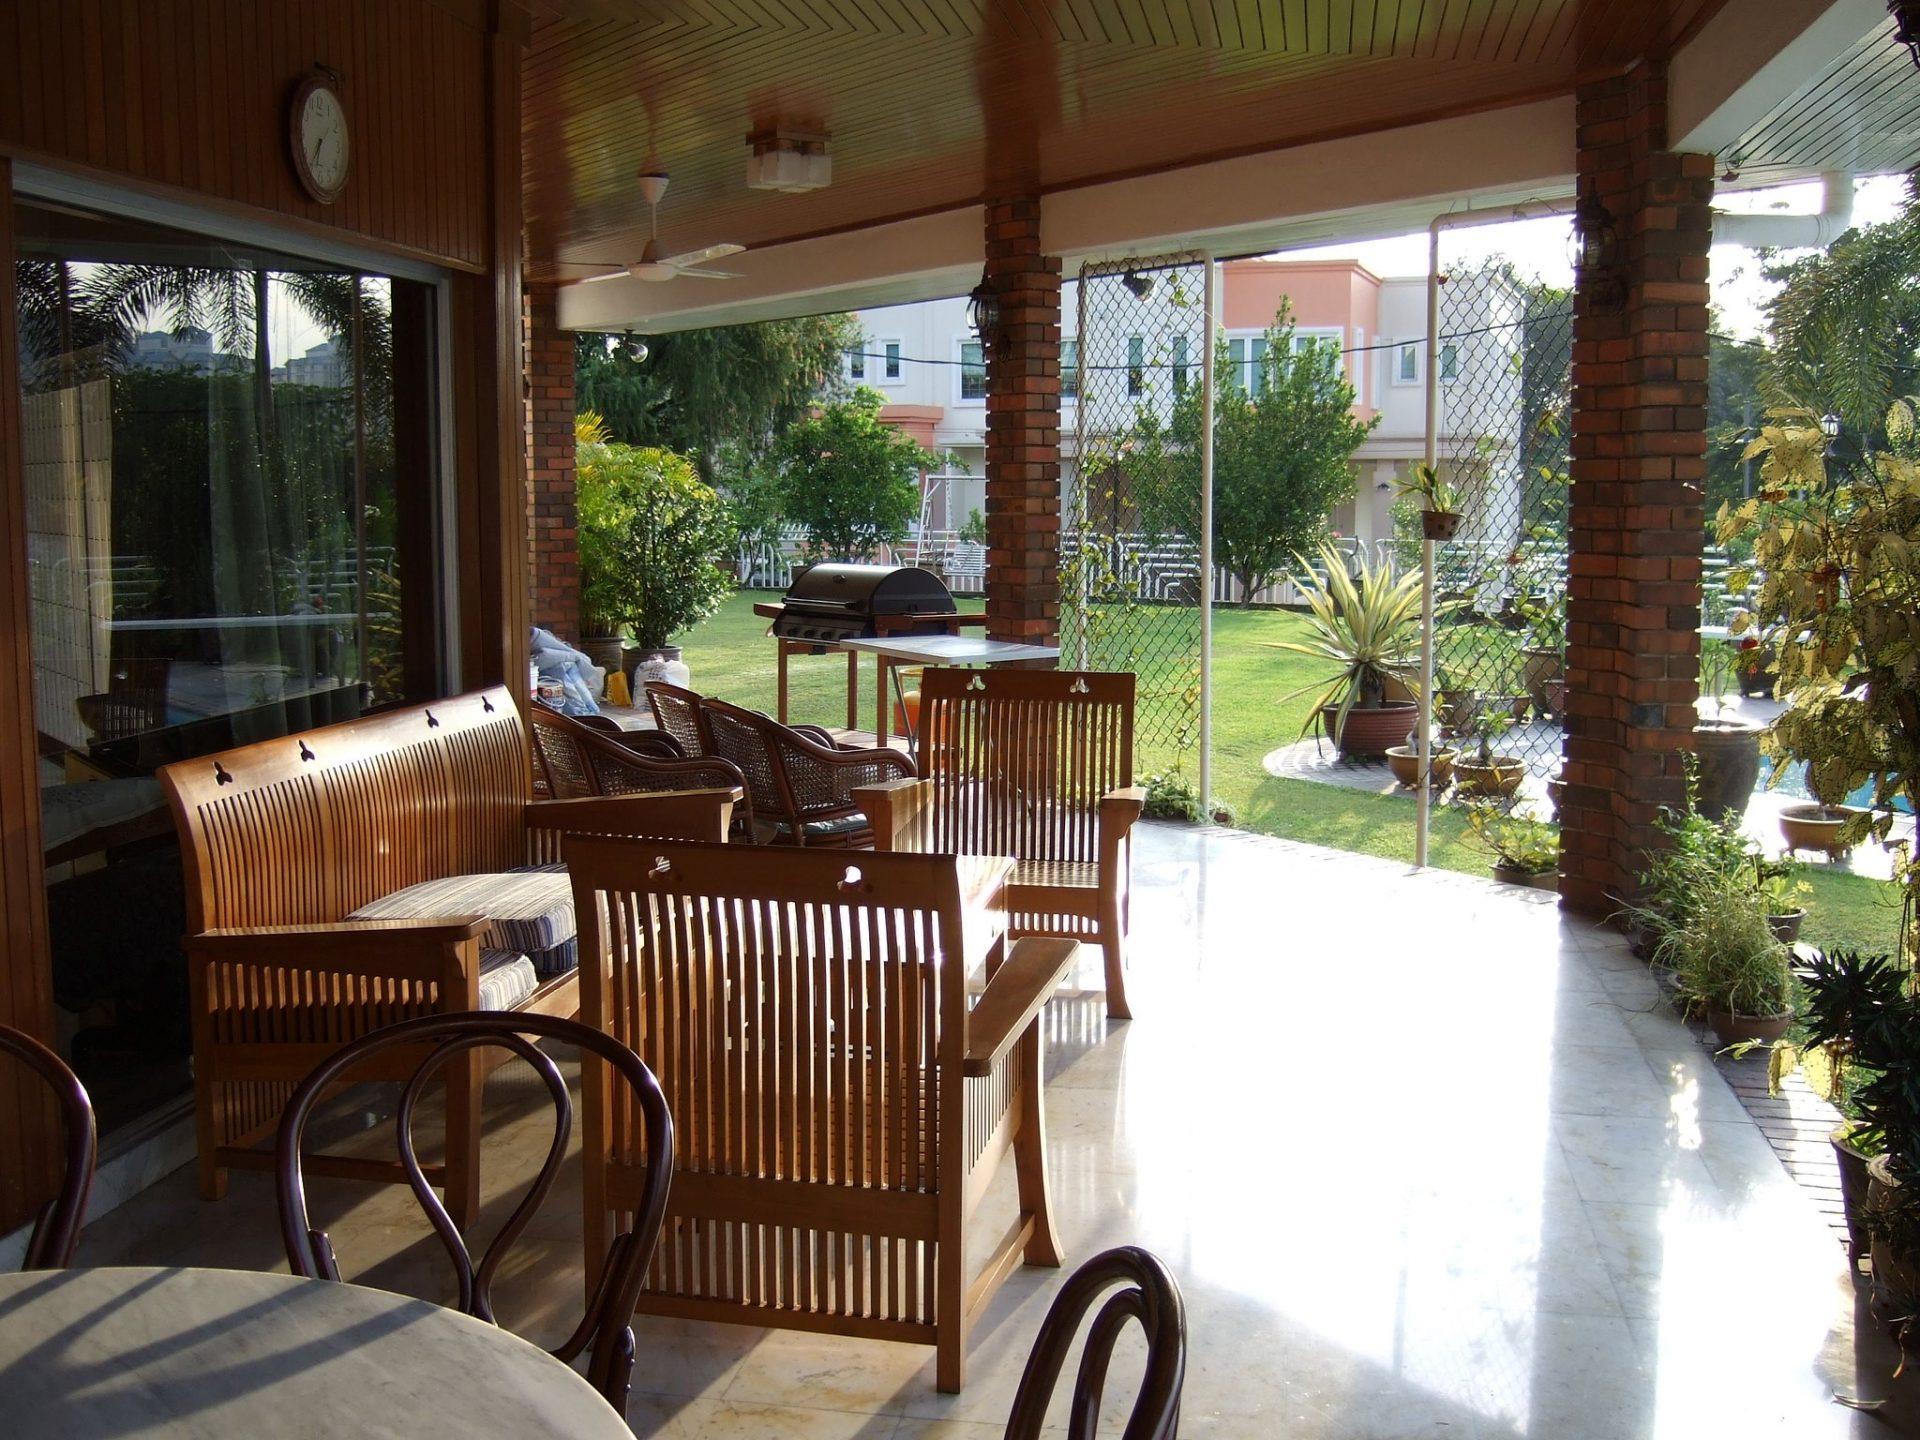 terasa-zahrada-drevo-stol-stolicky-kvetiny